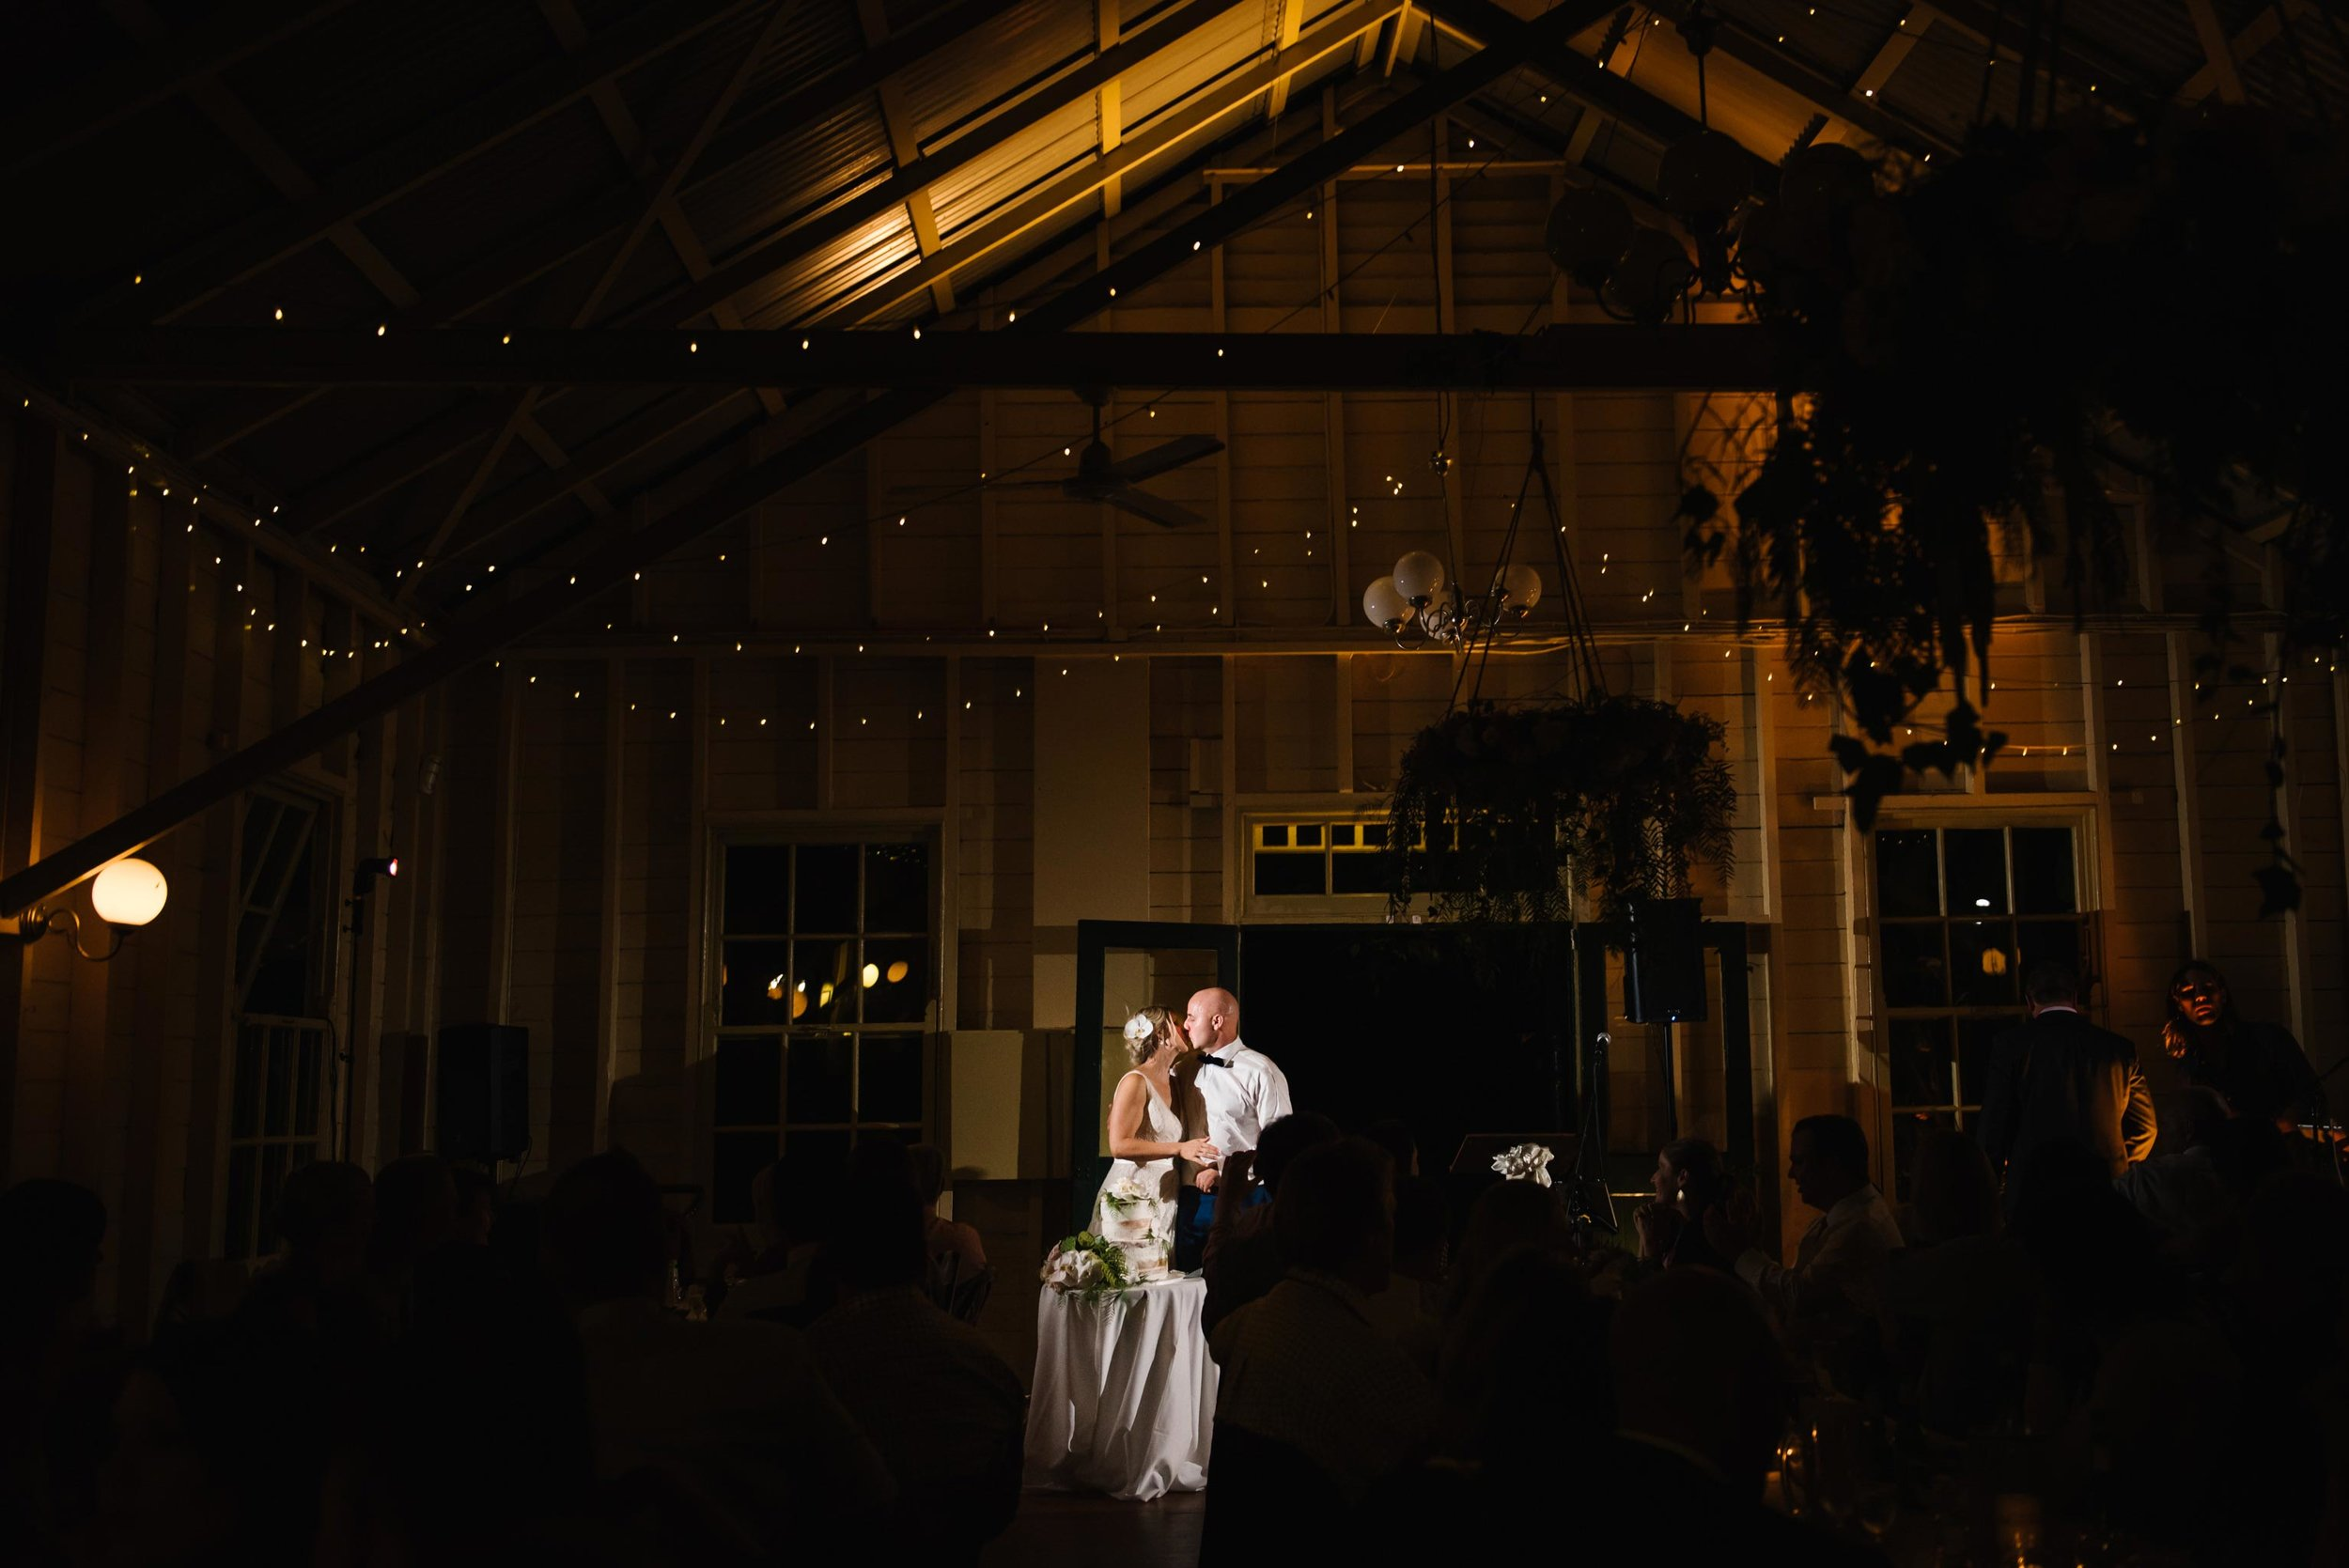 Newlyweds cut the cake at Athol Hall, Mosman wedding